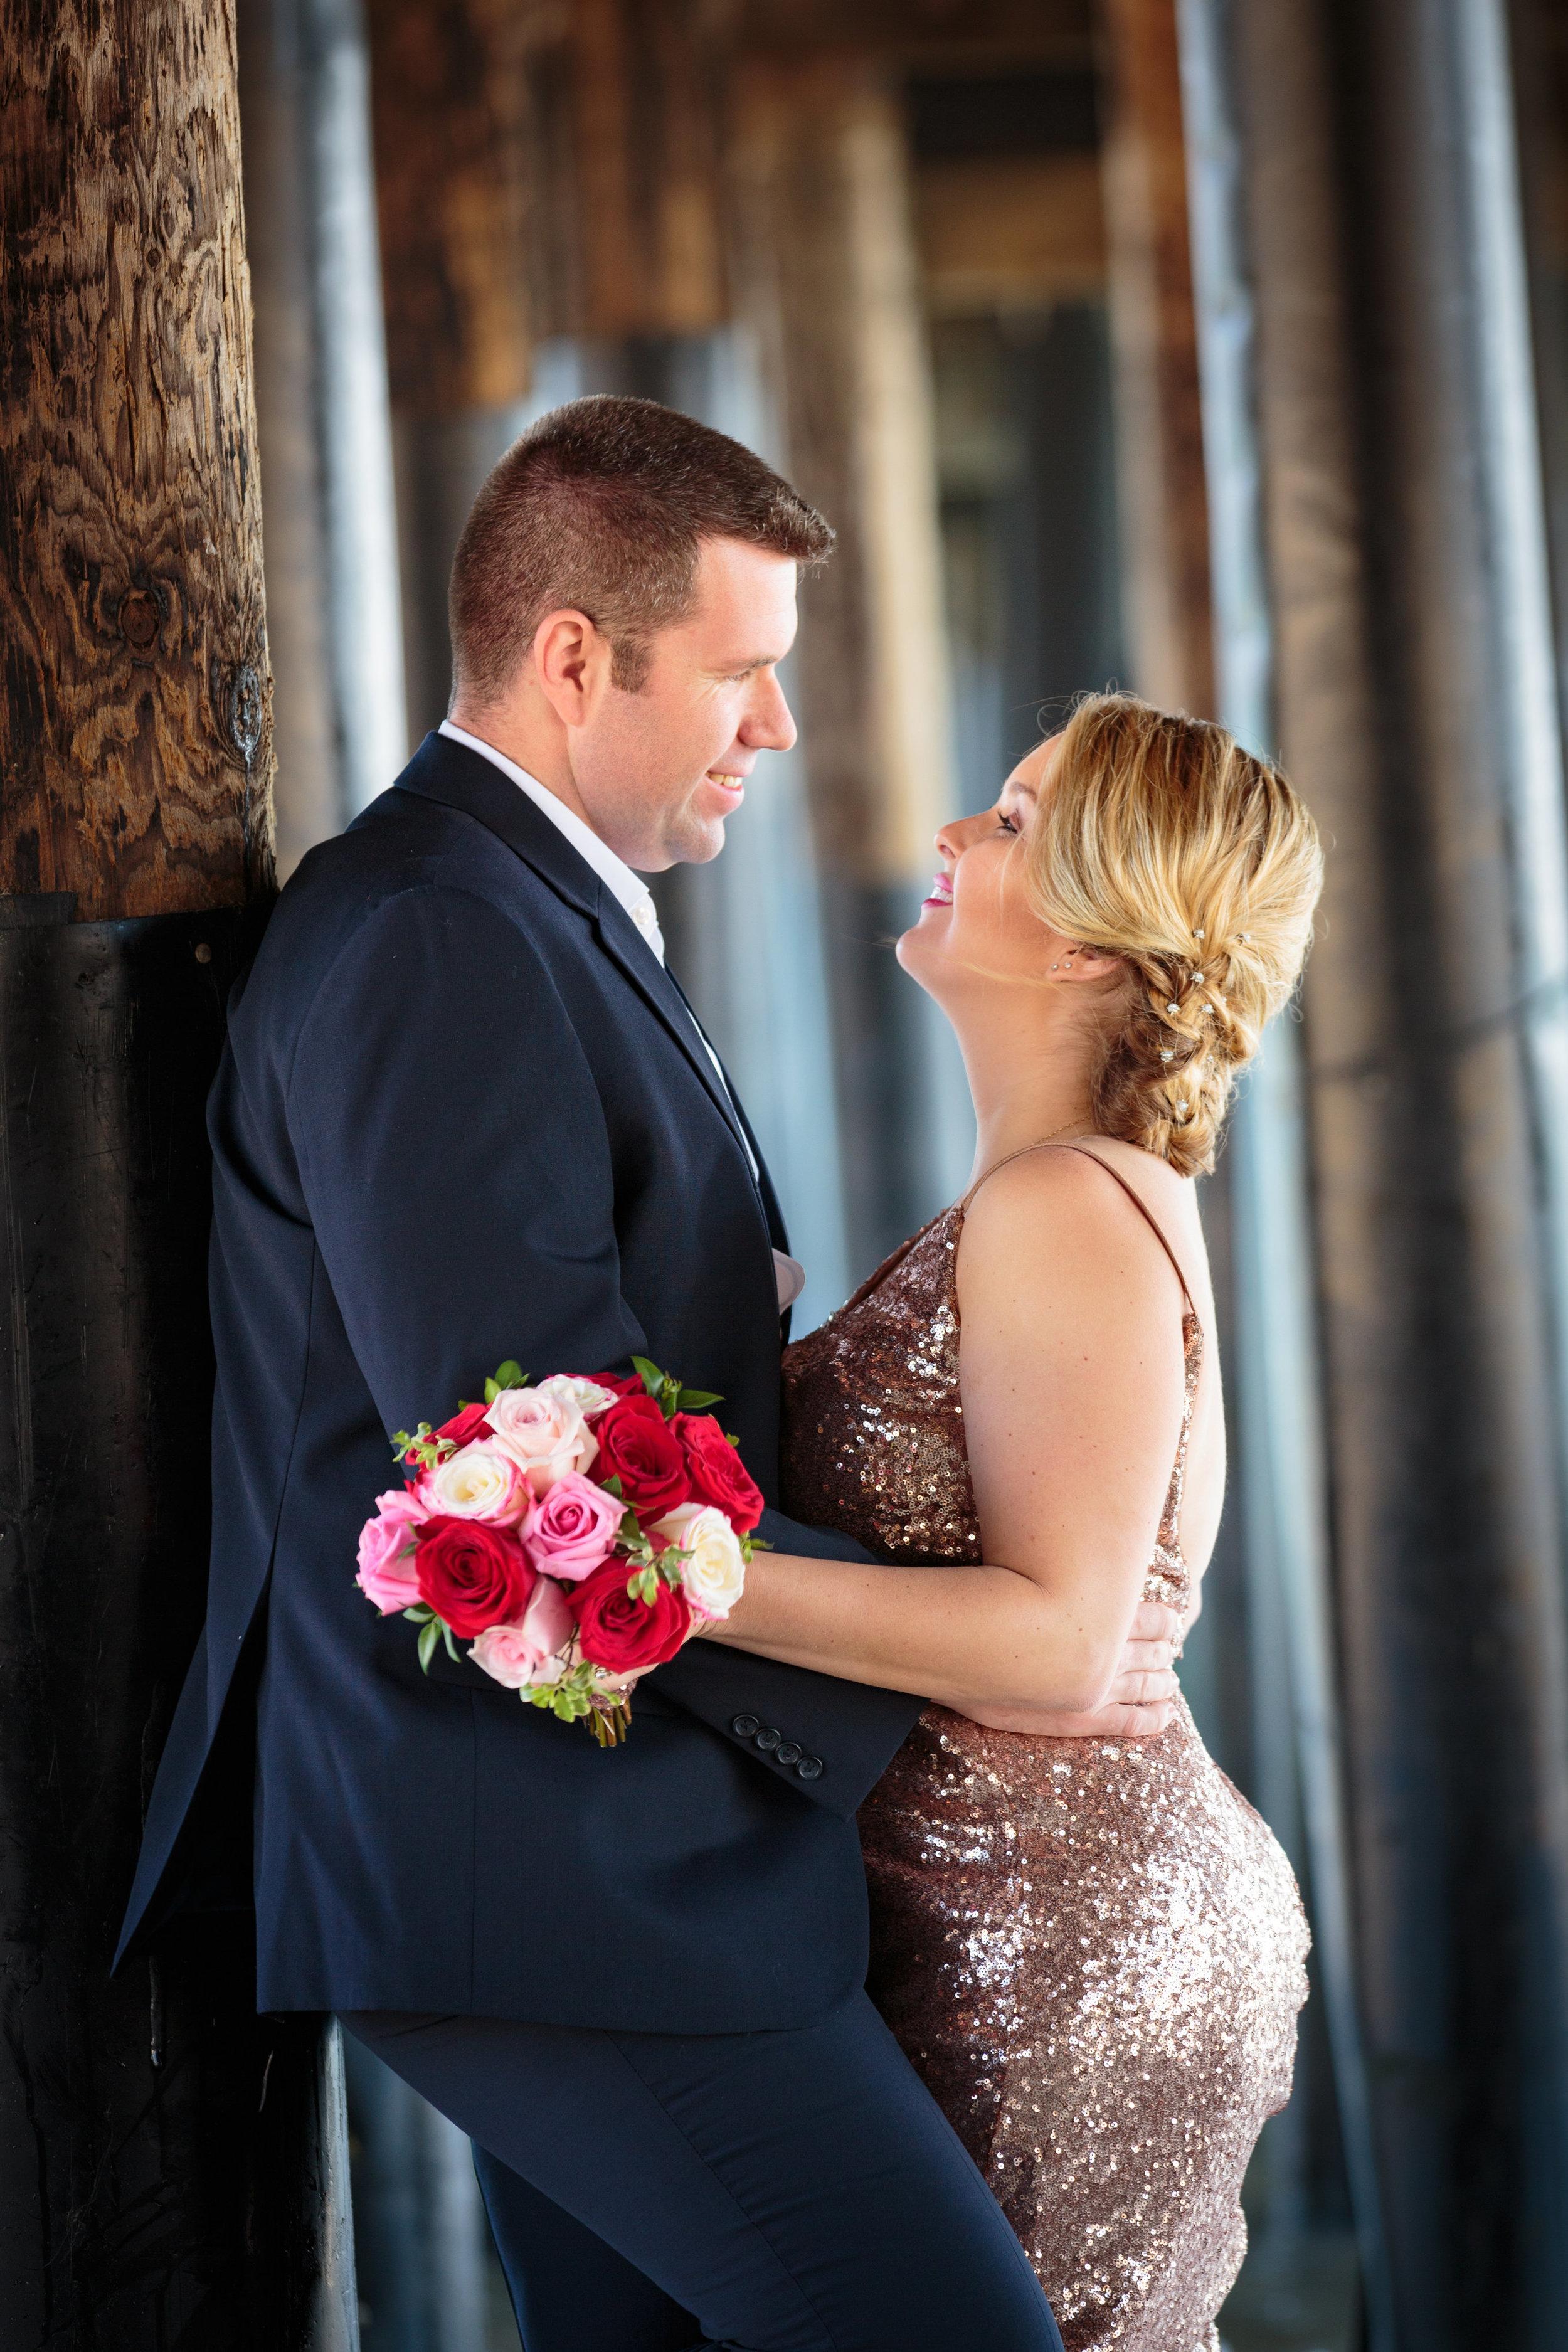 Cami Wedding-Cami Bushen Wedding-0049.jpg